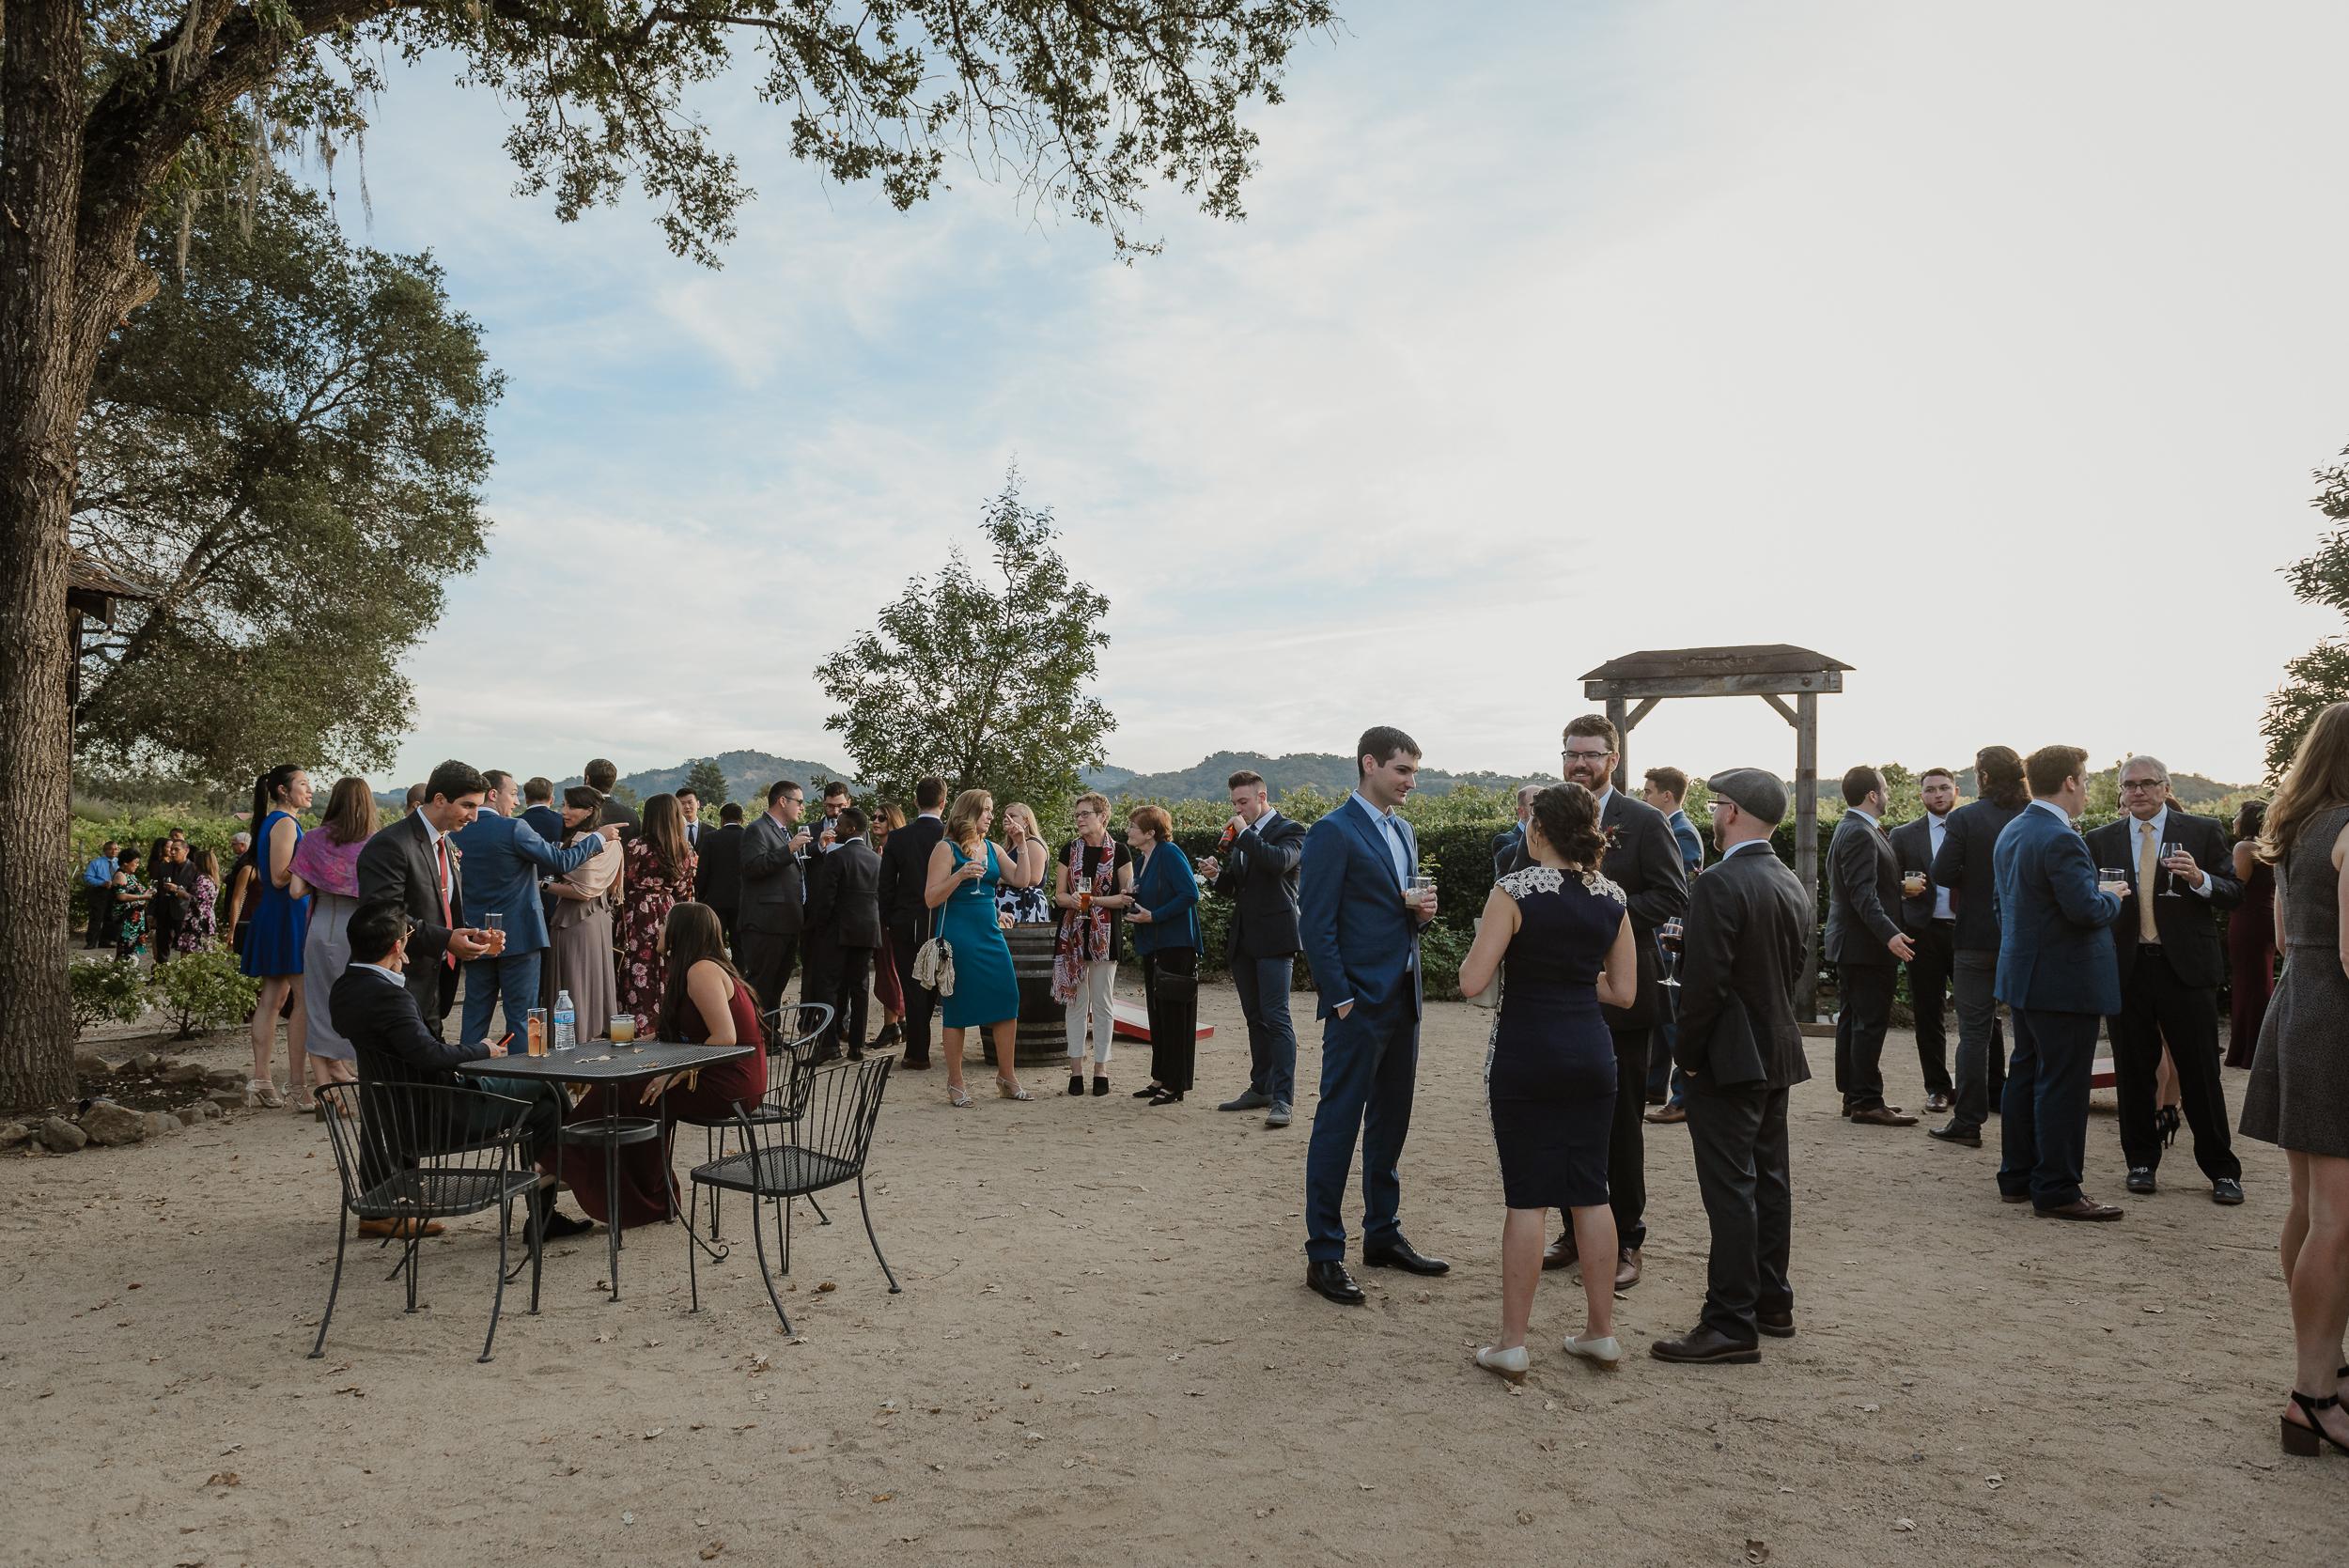 072-healdsburg-soda-rock-winery-wedding-vivianchen-584.jpg